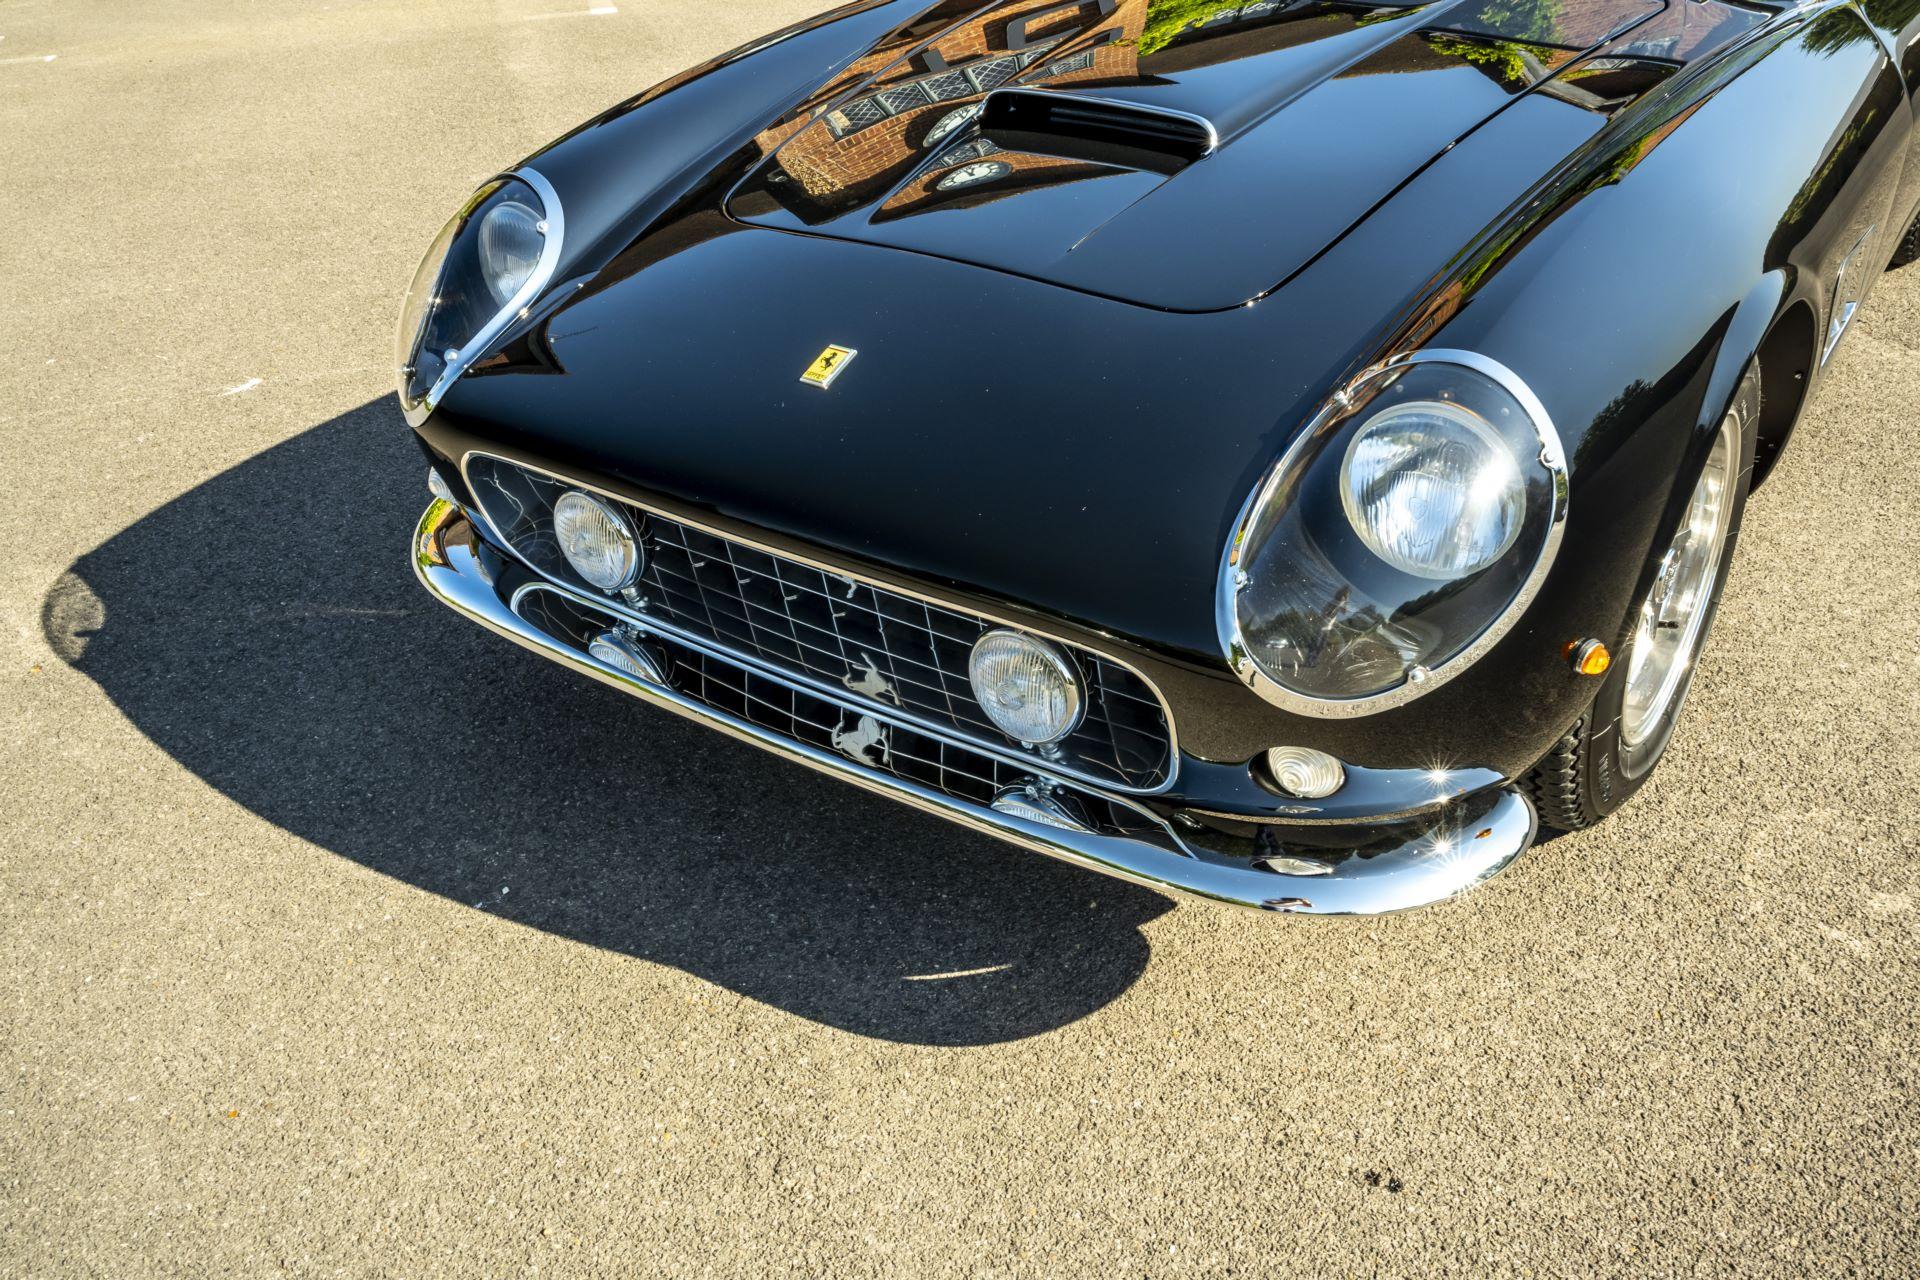 Ferrari-California-Spyder-by-GTO-Engineering-14